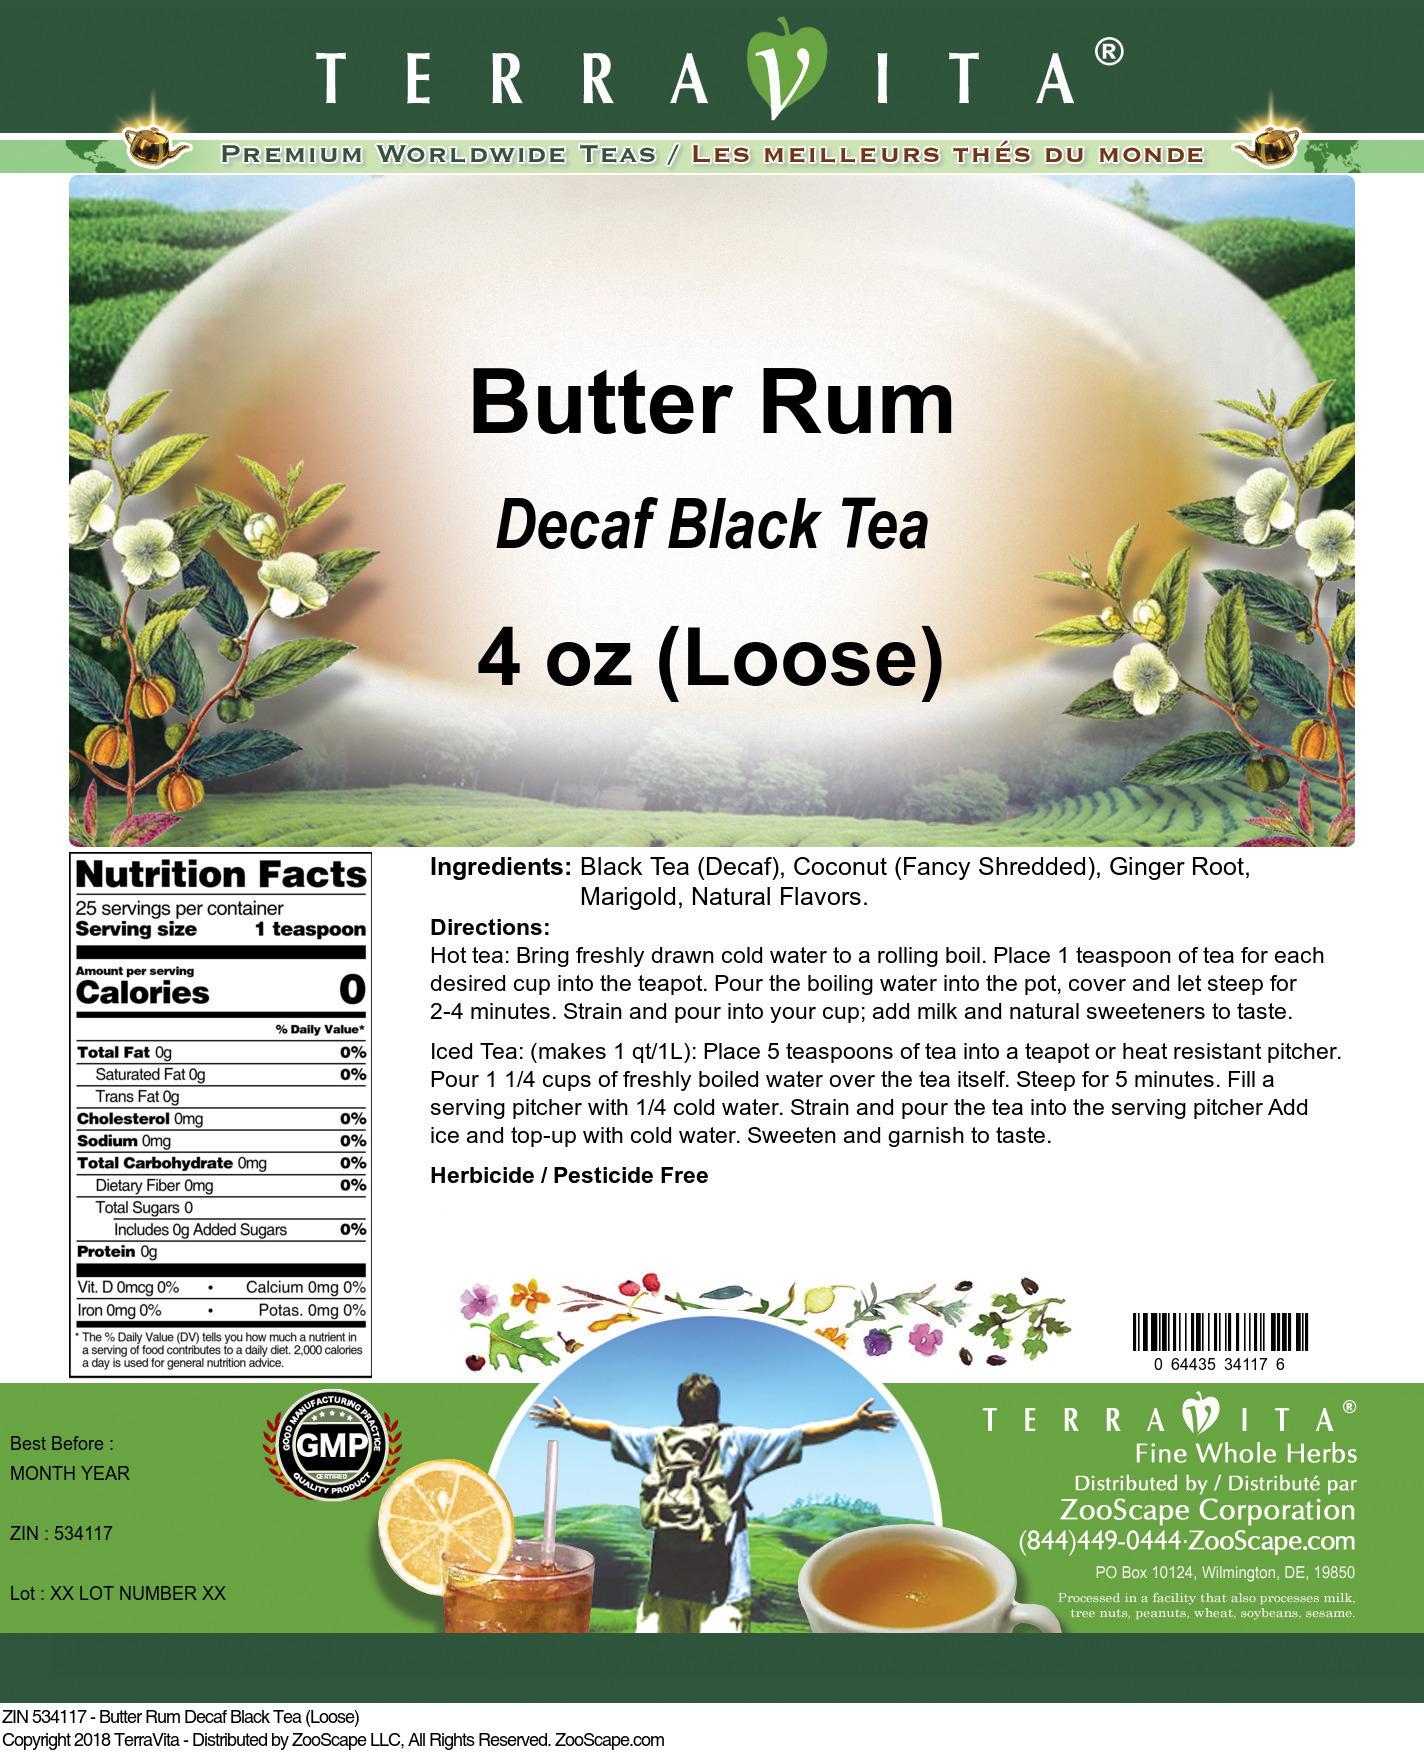 Butter Rum Decaf Black Tea (Loose)